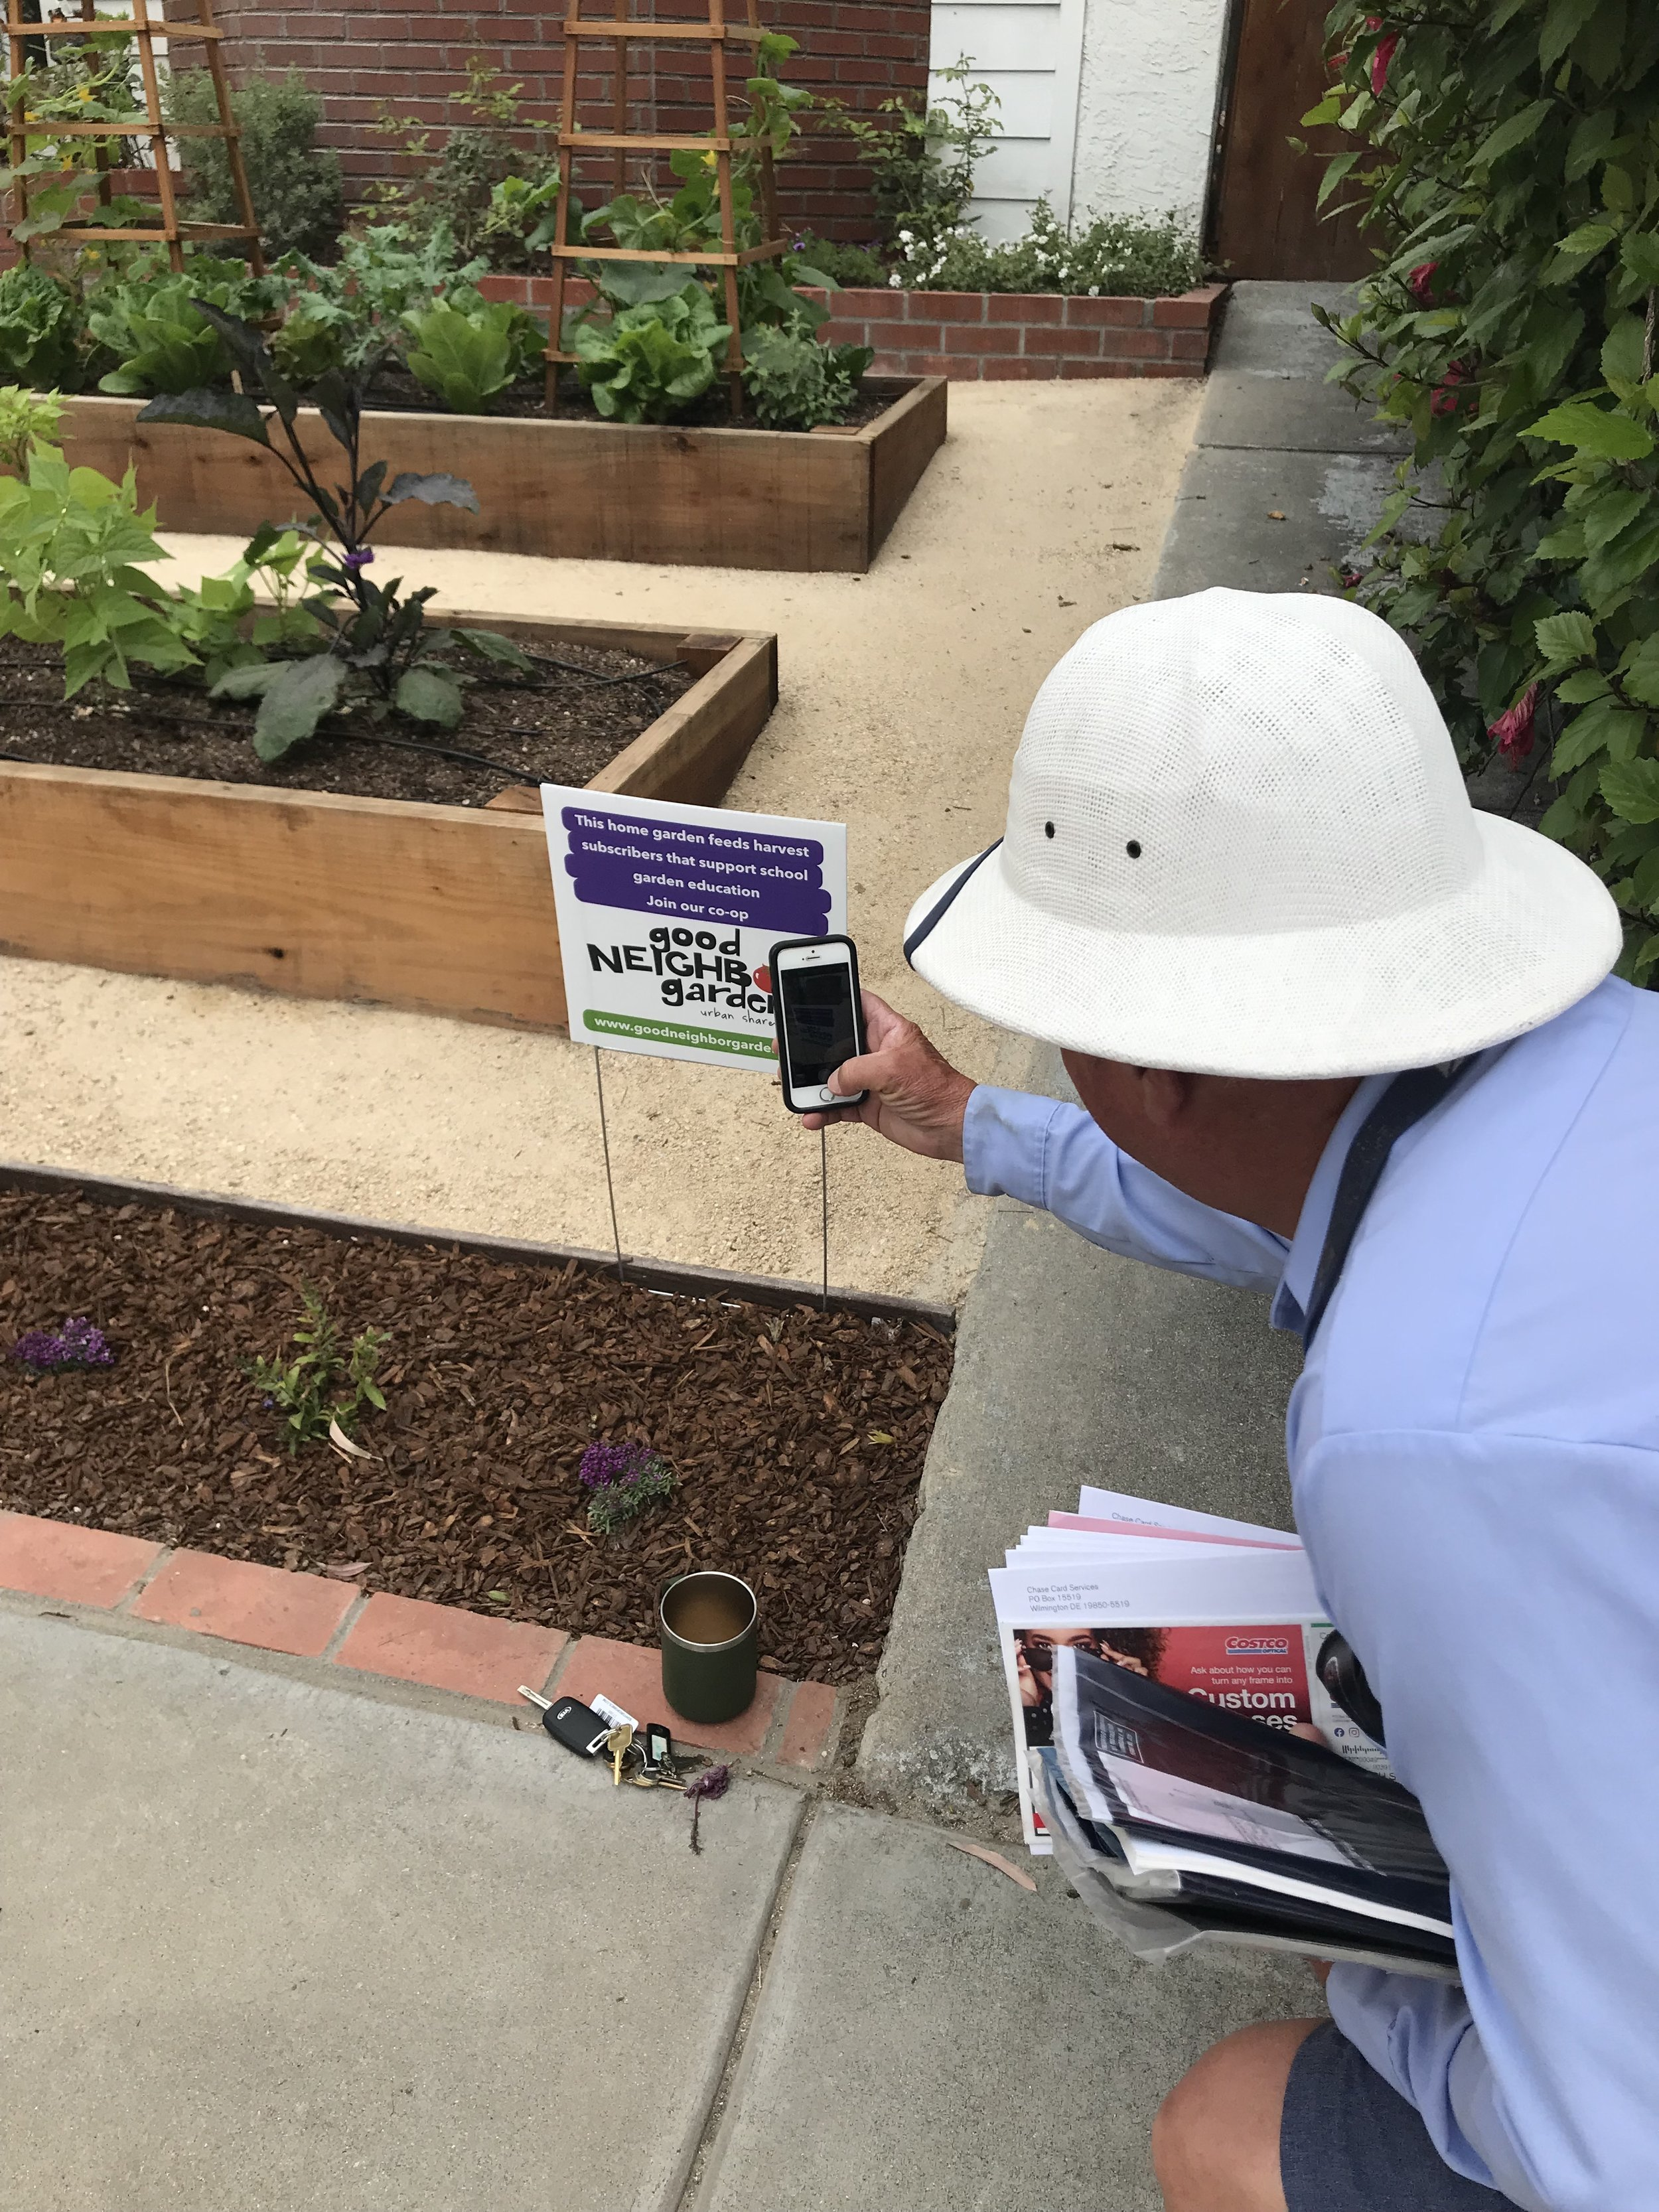 Leonard snaps a photo of the Good Neighbor Gardens yard sign